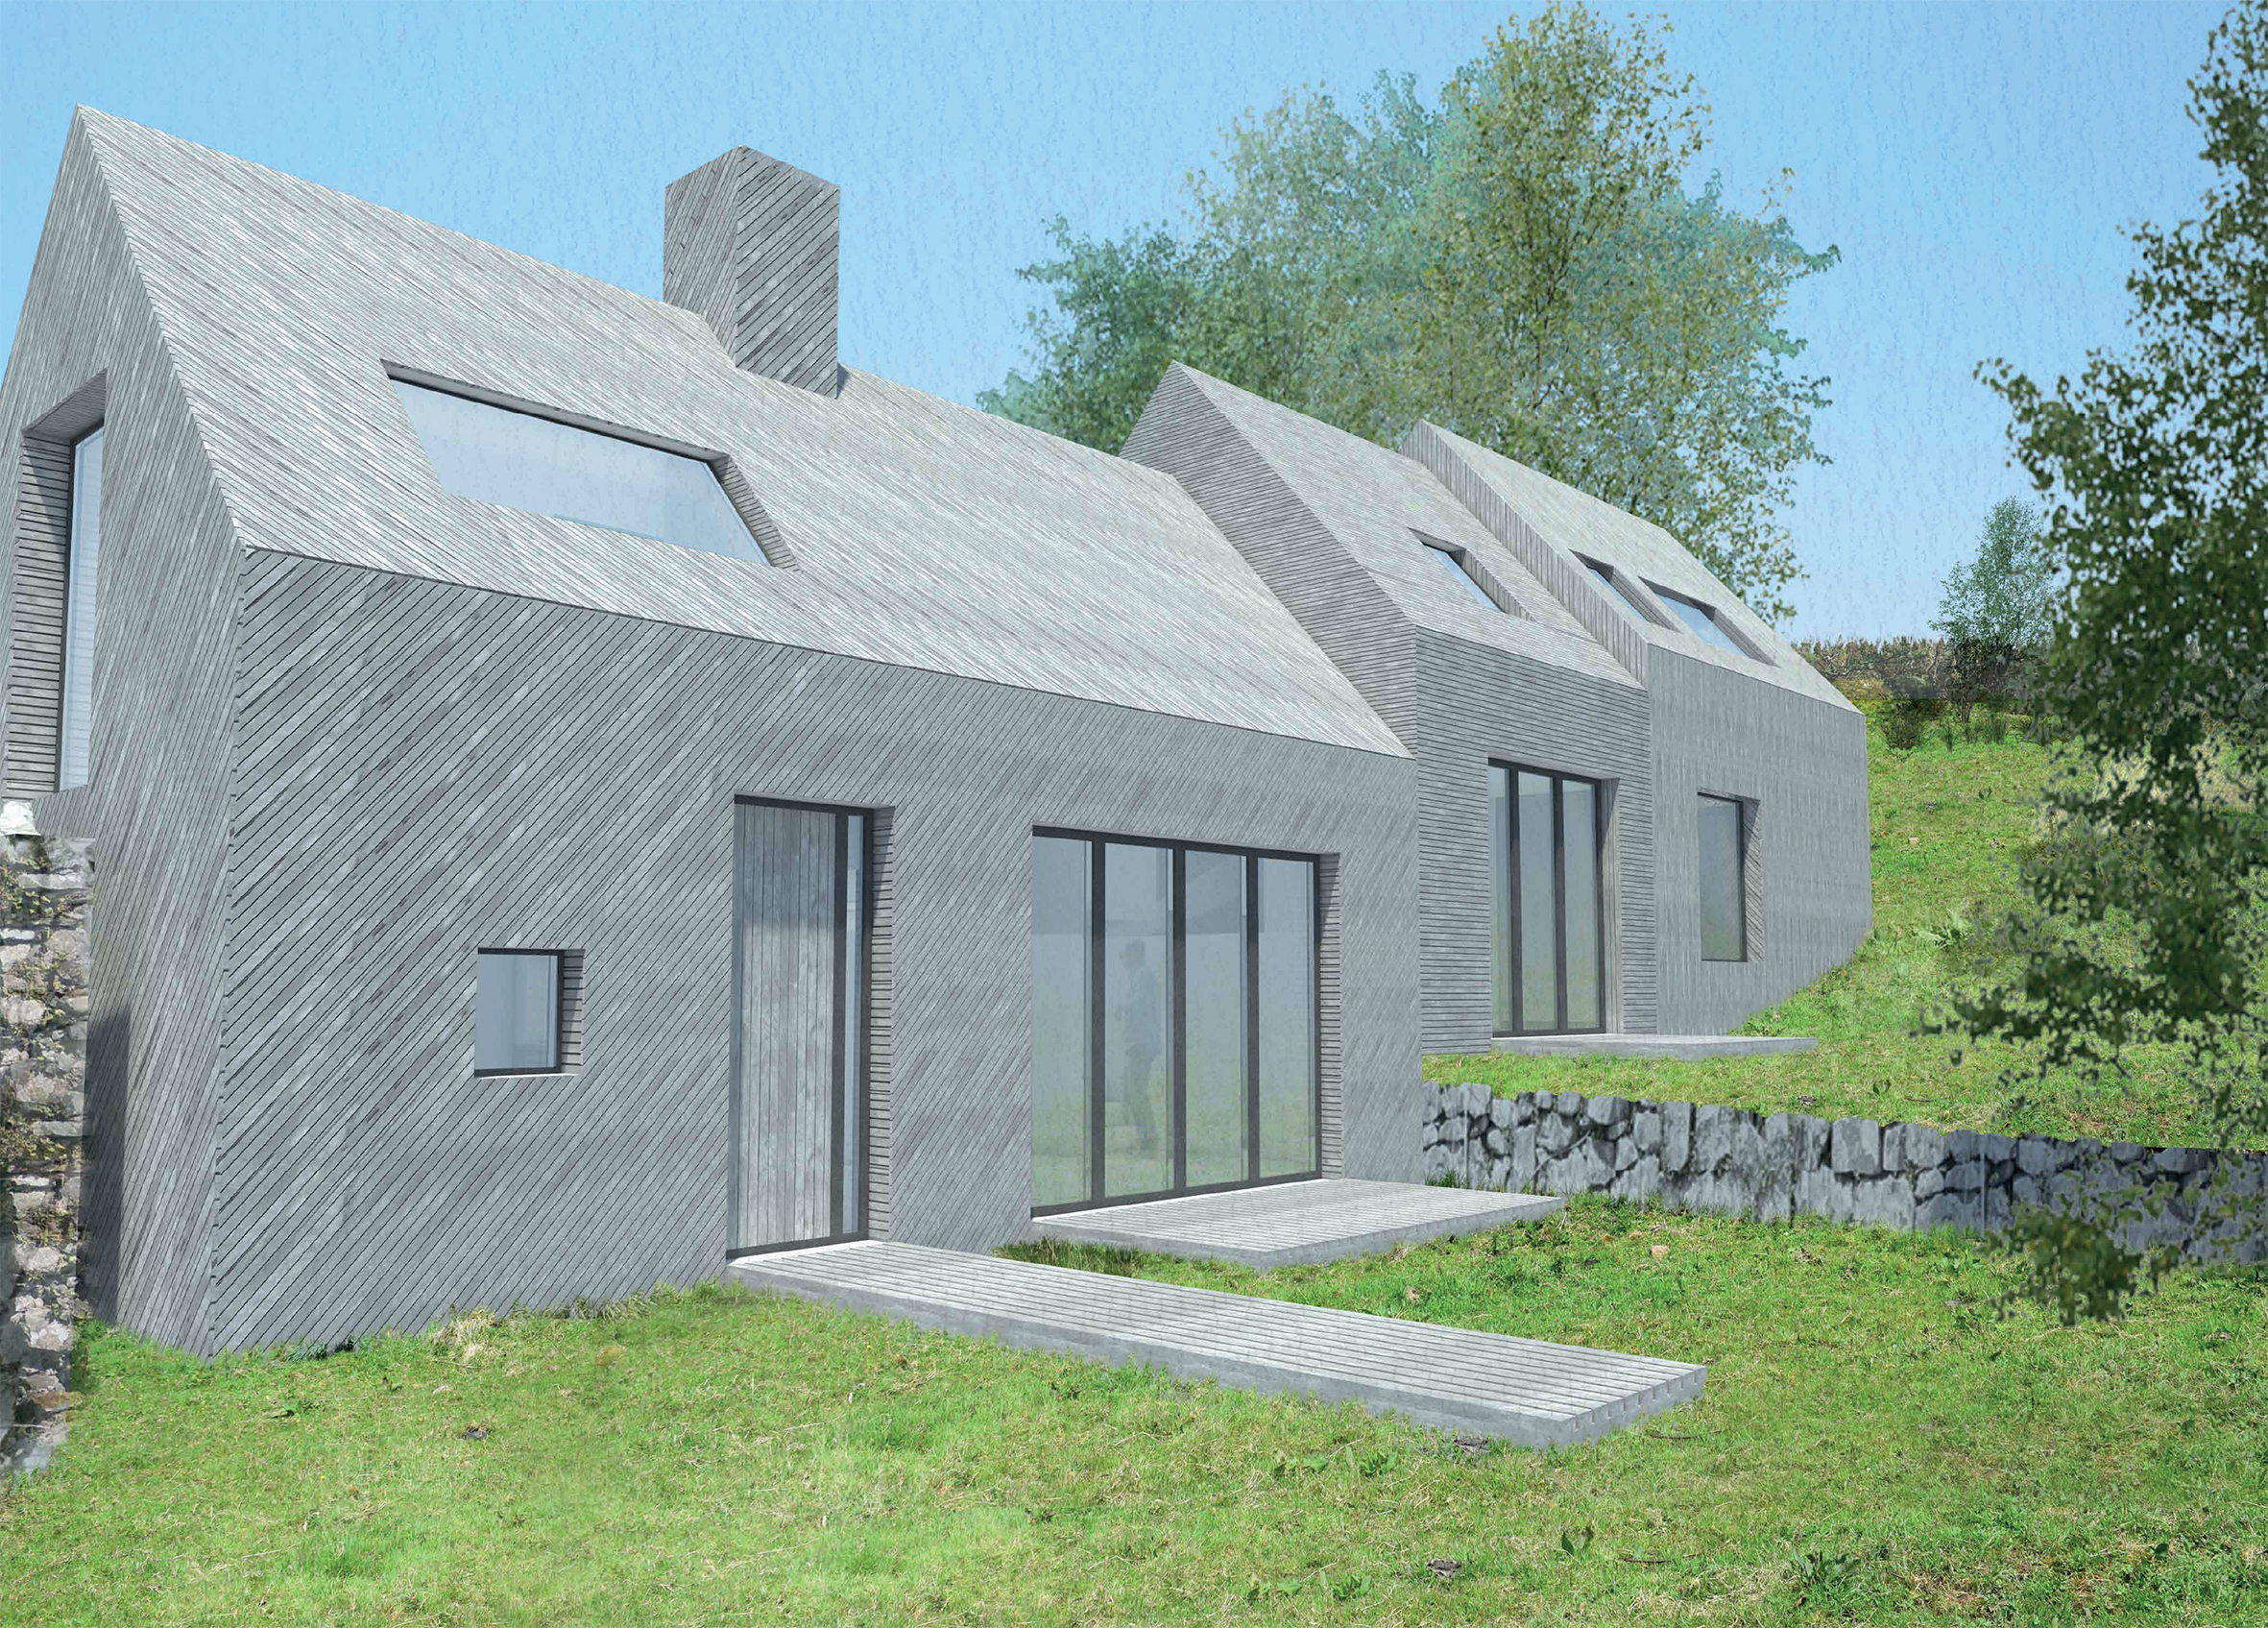 Architect Designed Rural House Arran · 208_151123_704_Exterior 4